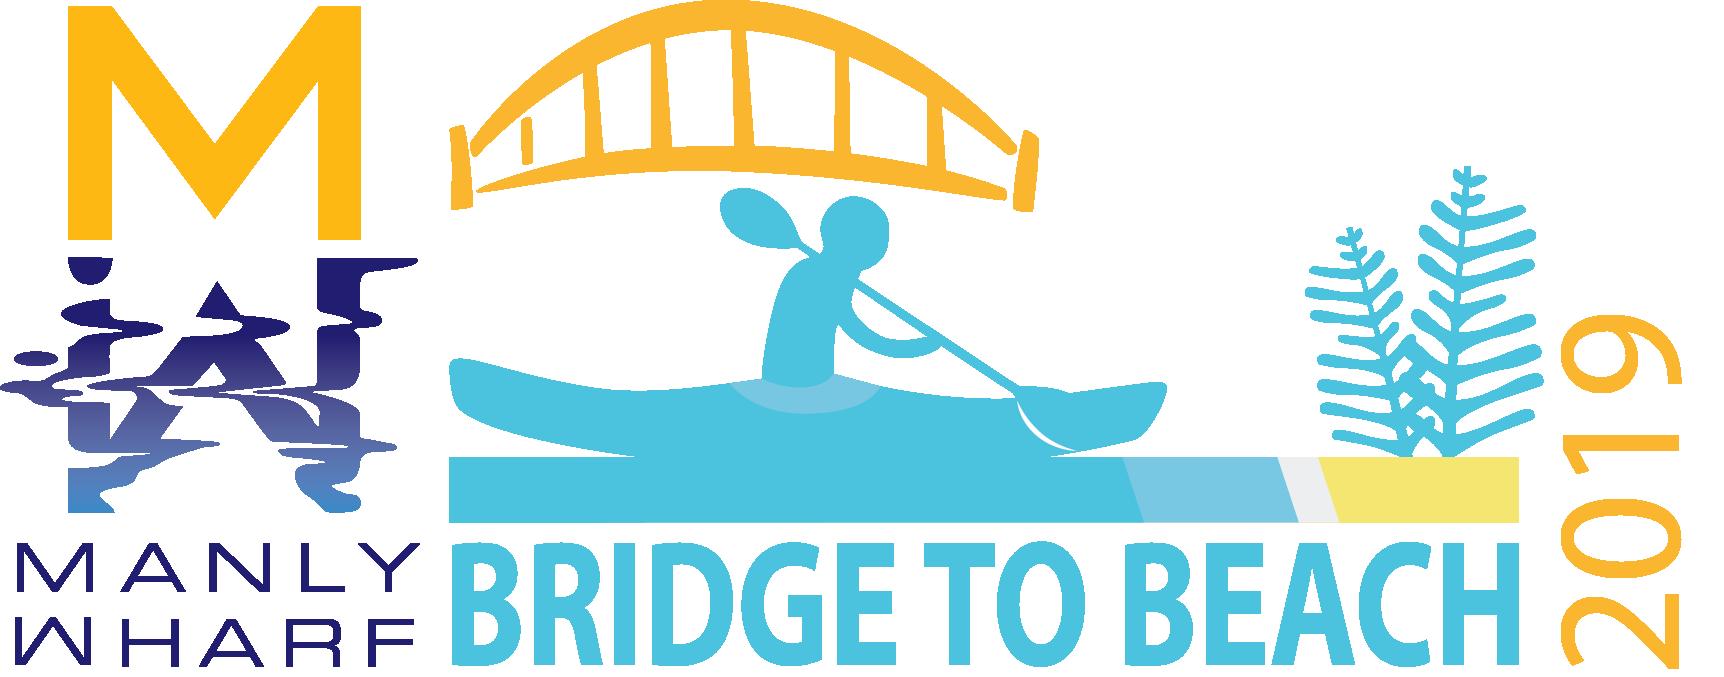 b2b logo 2019 web